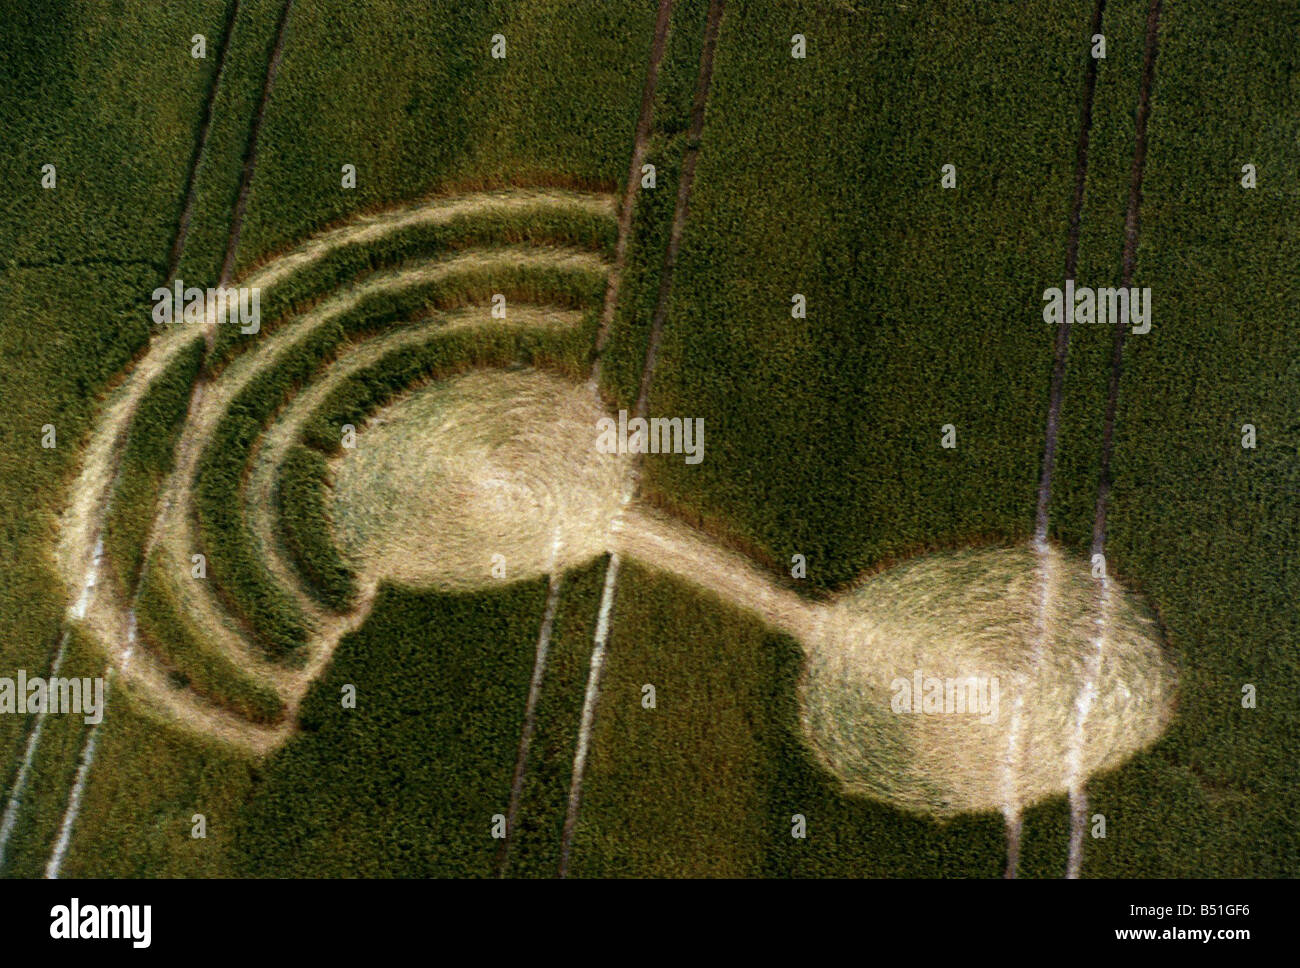 Mysteries Crop Circles aerial shot - Stock Image